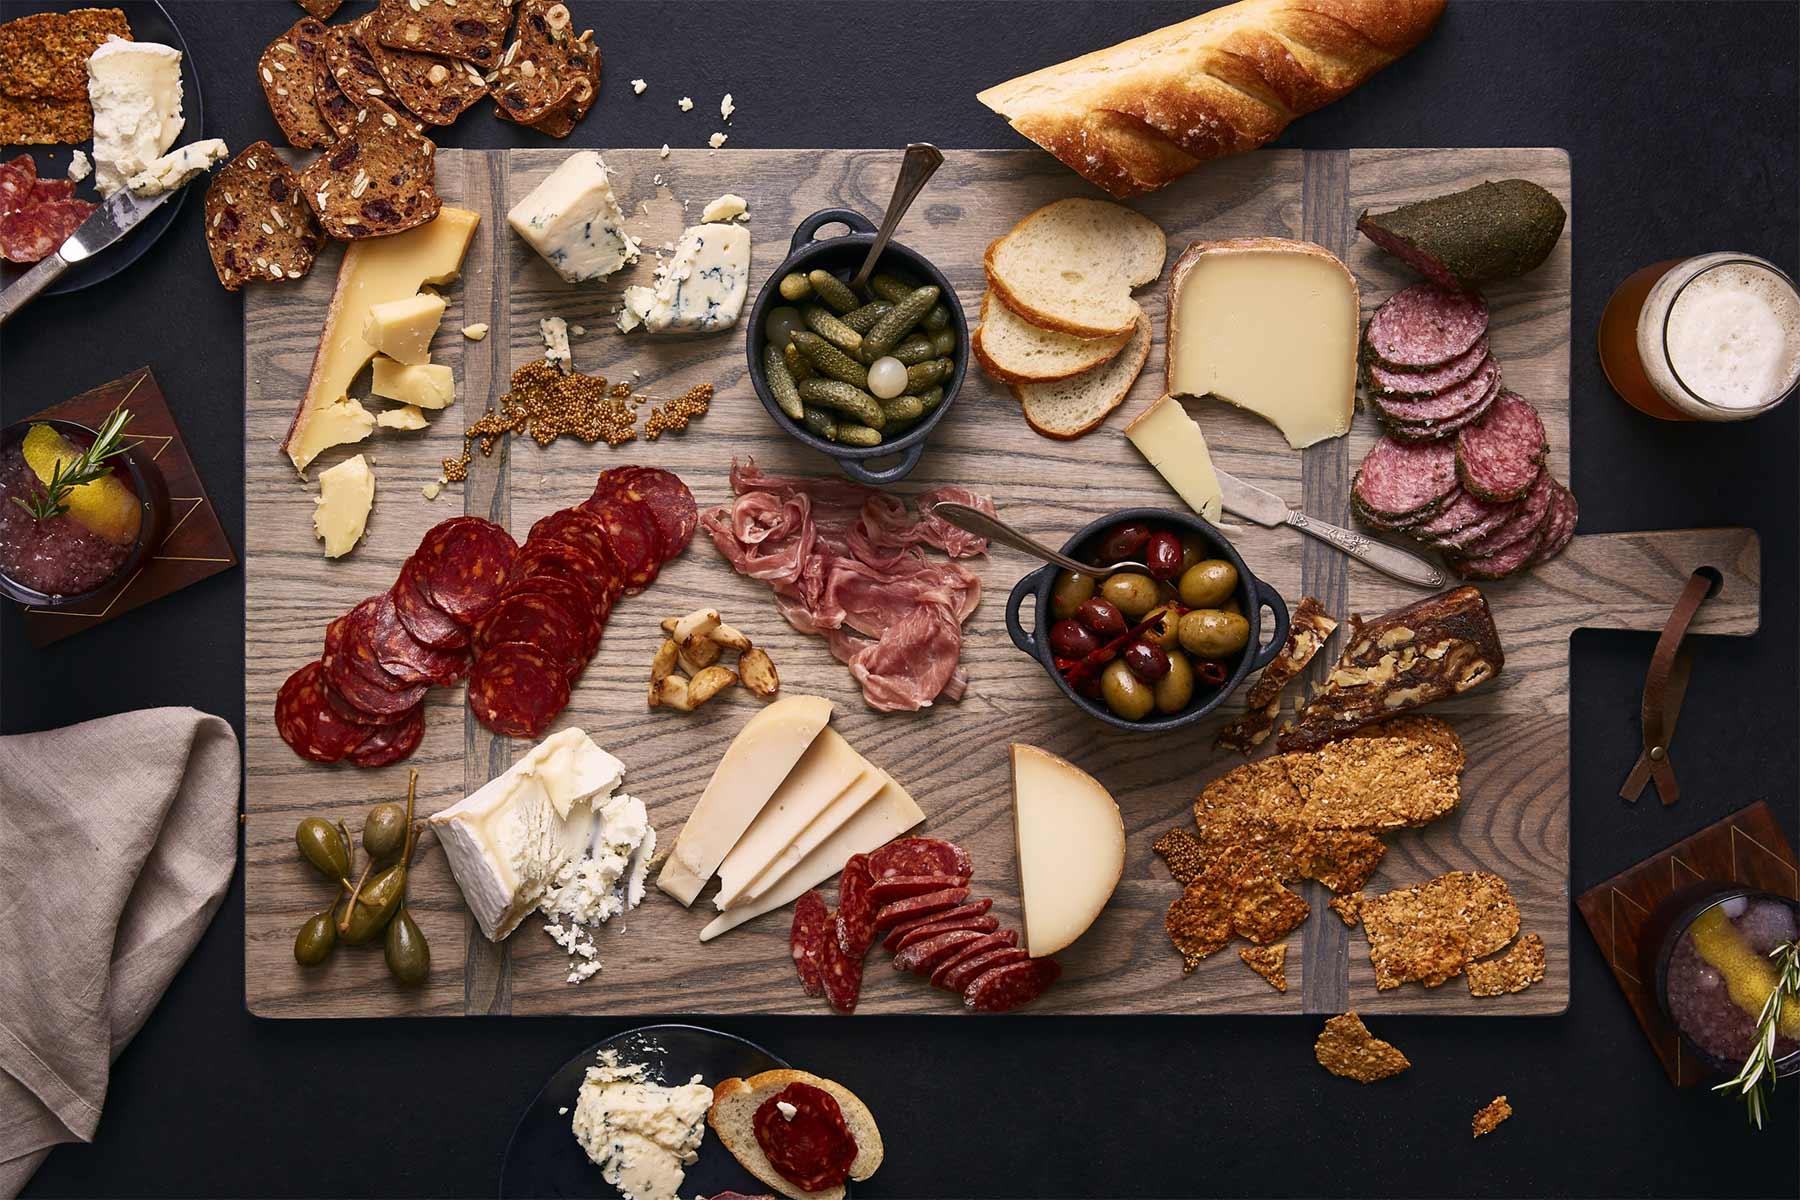 Fototrafie: Vinnie Finn Foodography-Vinnie-Finn_01